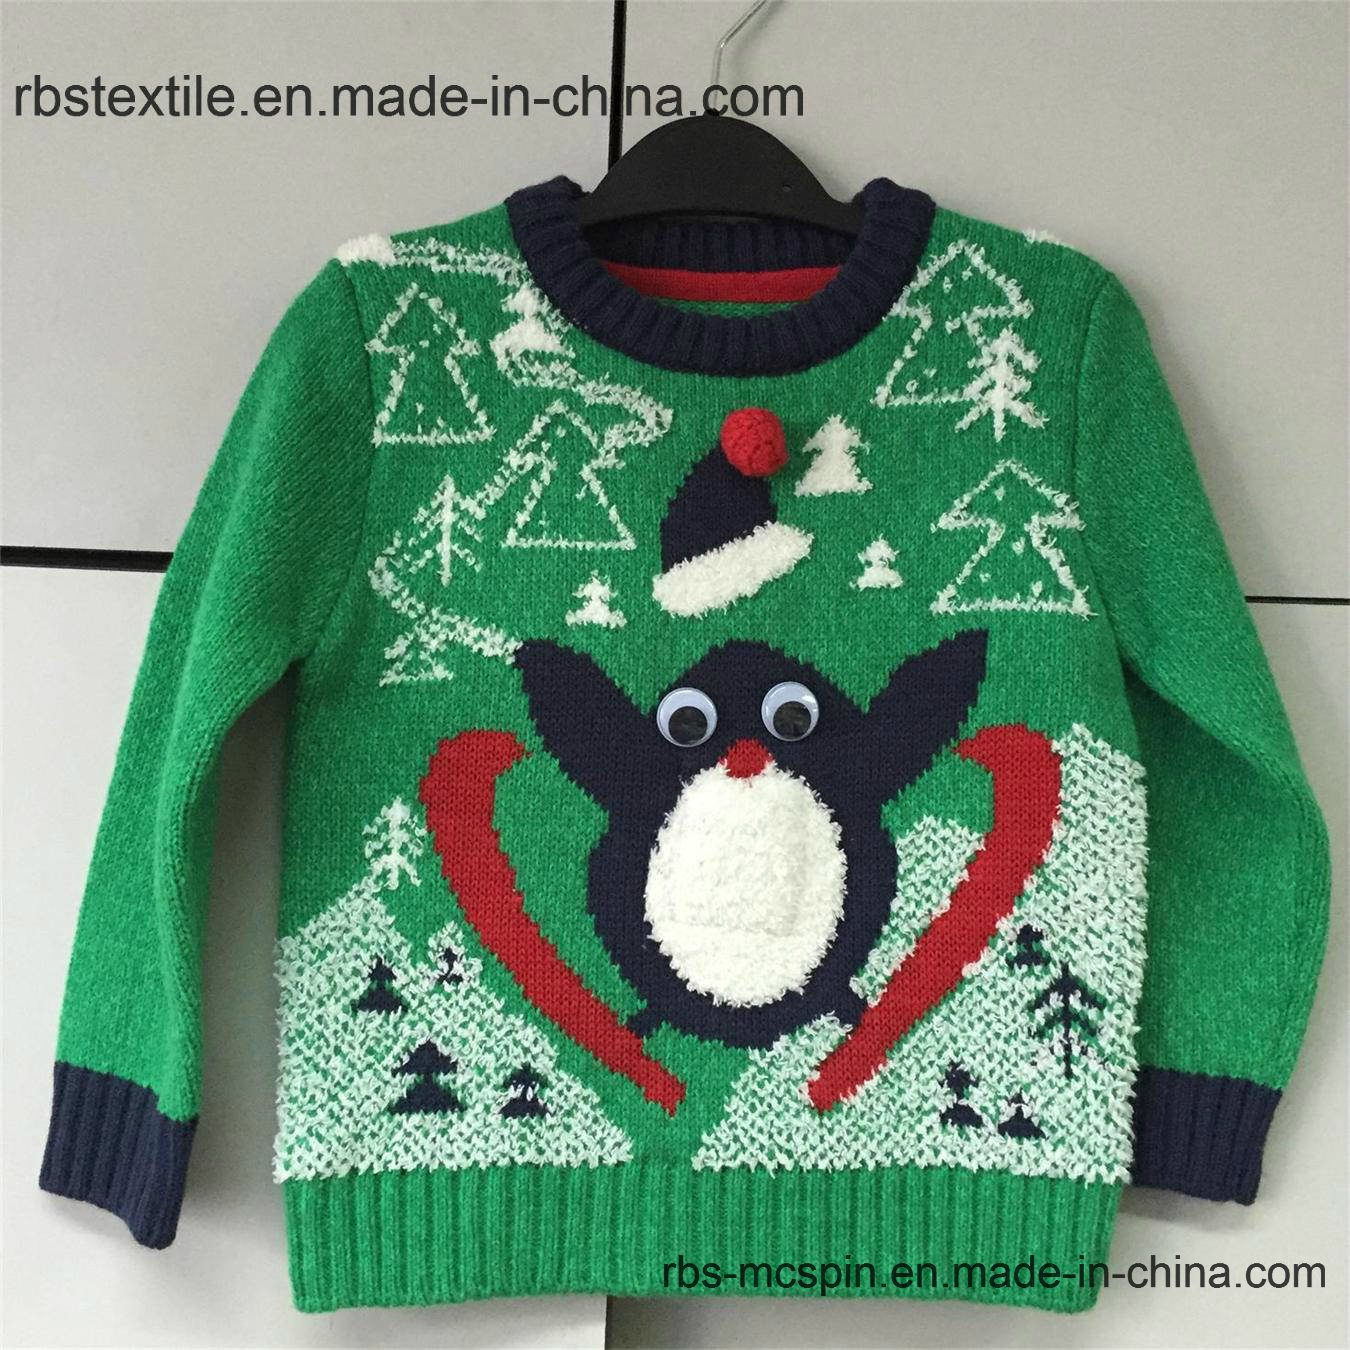 Girls Intarsia Jumper - True Kids Knitted Sweater